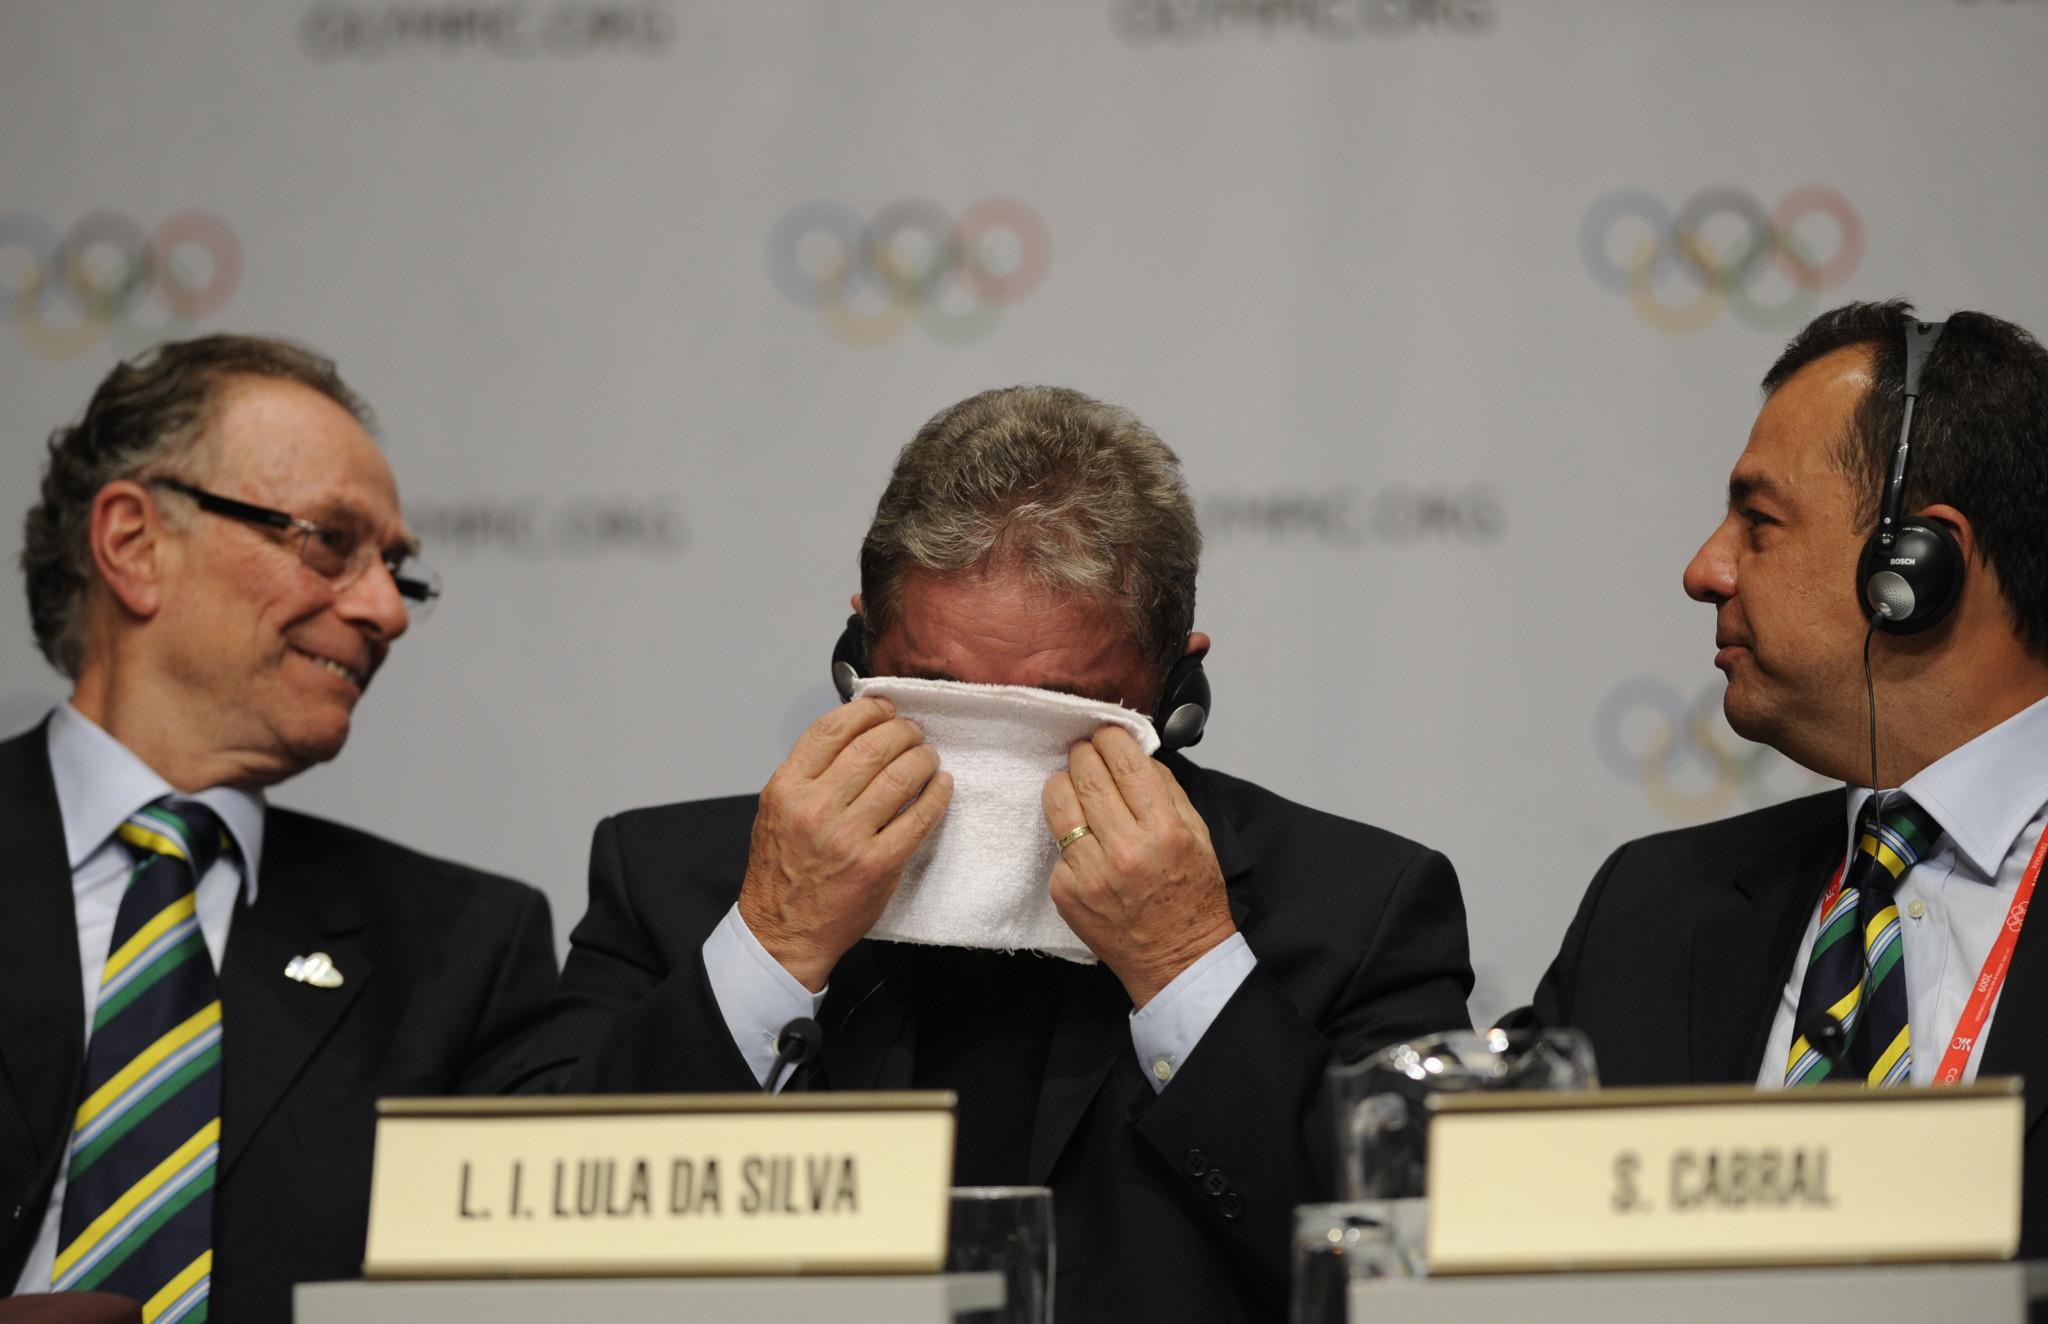 Luiz Inacio Lula da Silva, centre, pictured in between Carlos Nuzman, left, and Sérgio Cabral during the IOC Session in Copenhagen where Rio were awarded the Games ©Getty Images